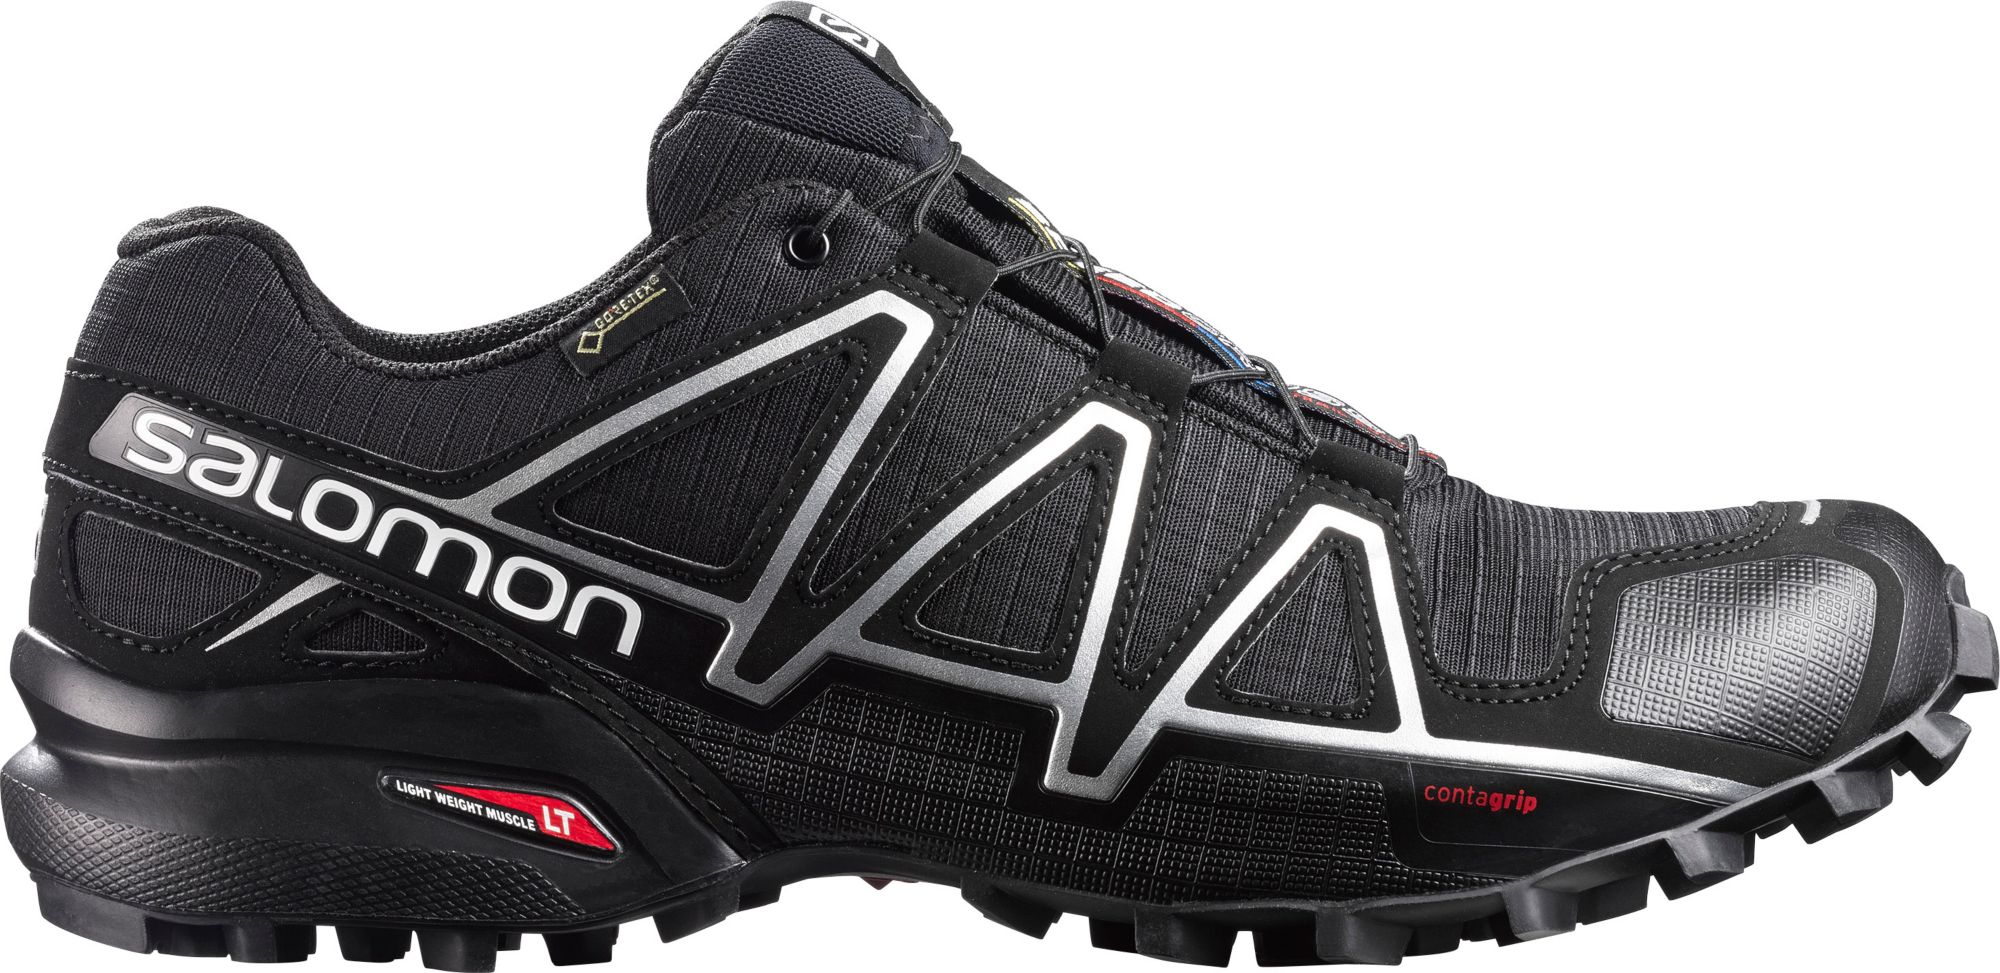 new style 1c936 cdb6f Salomon Men s Speedcross 4 GTX Waterproof Trail Running Shoes   DICK S  Sporting GoodsProposition 65 warning iconProposition 65 warning icon